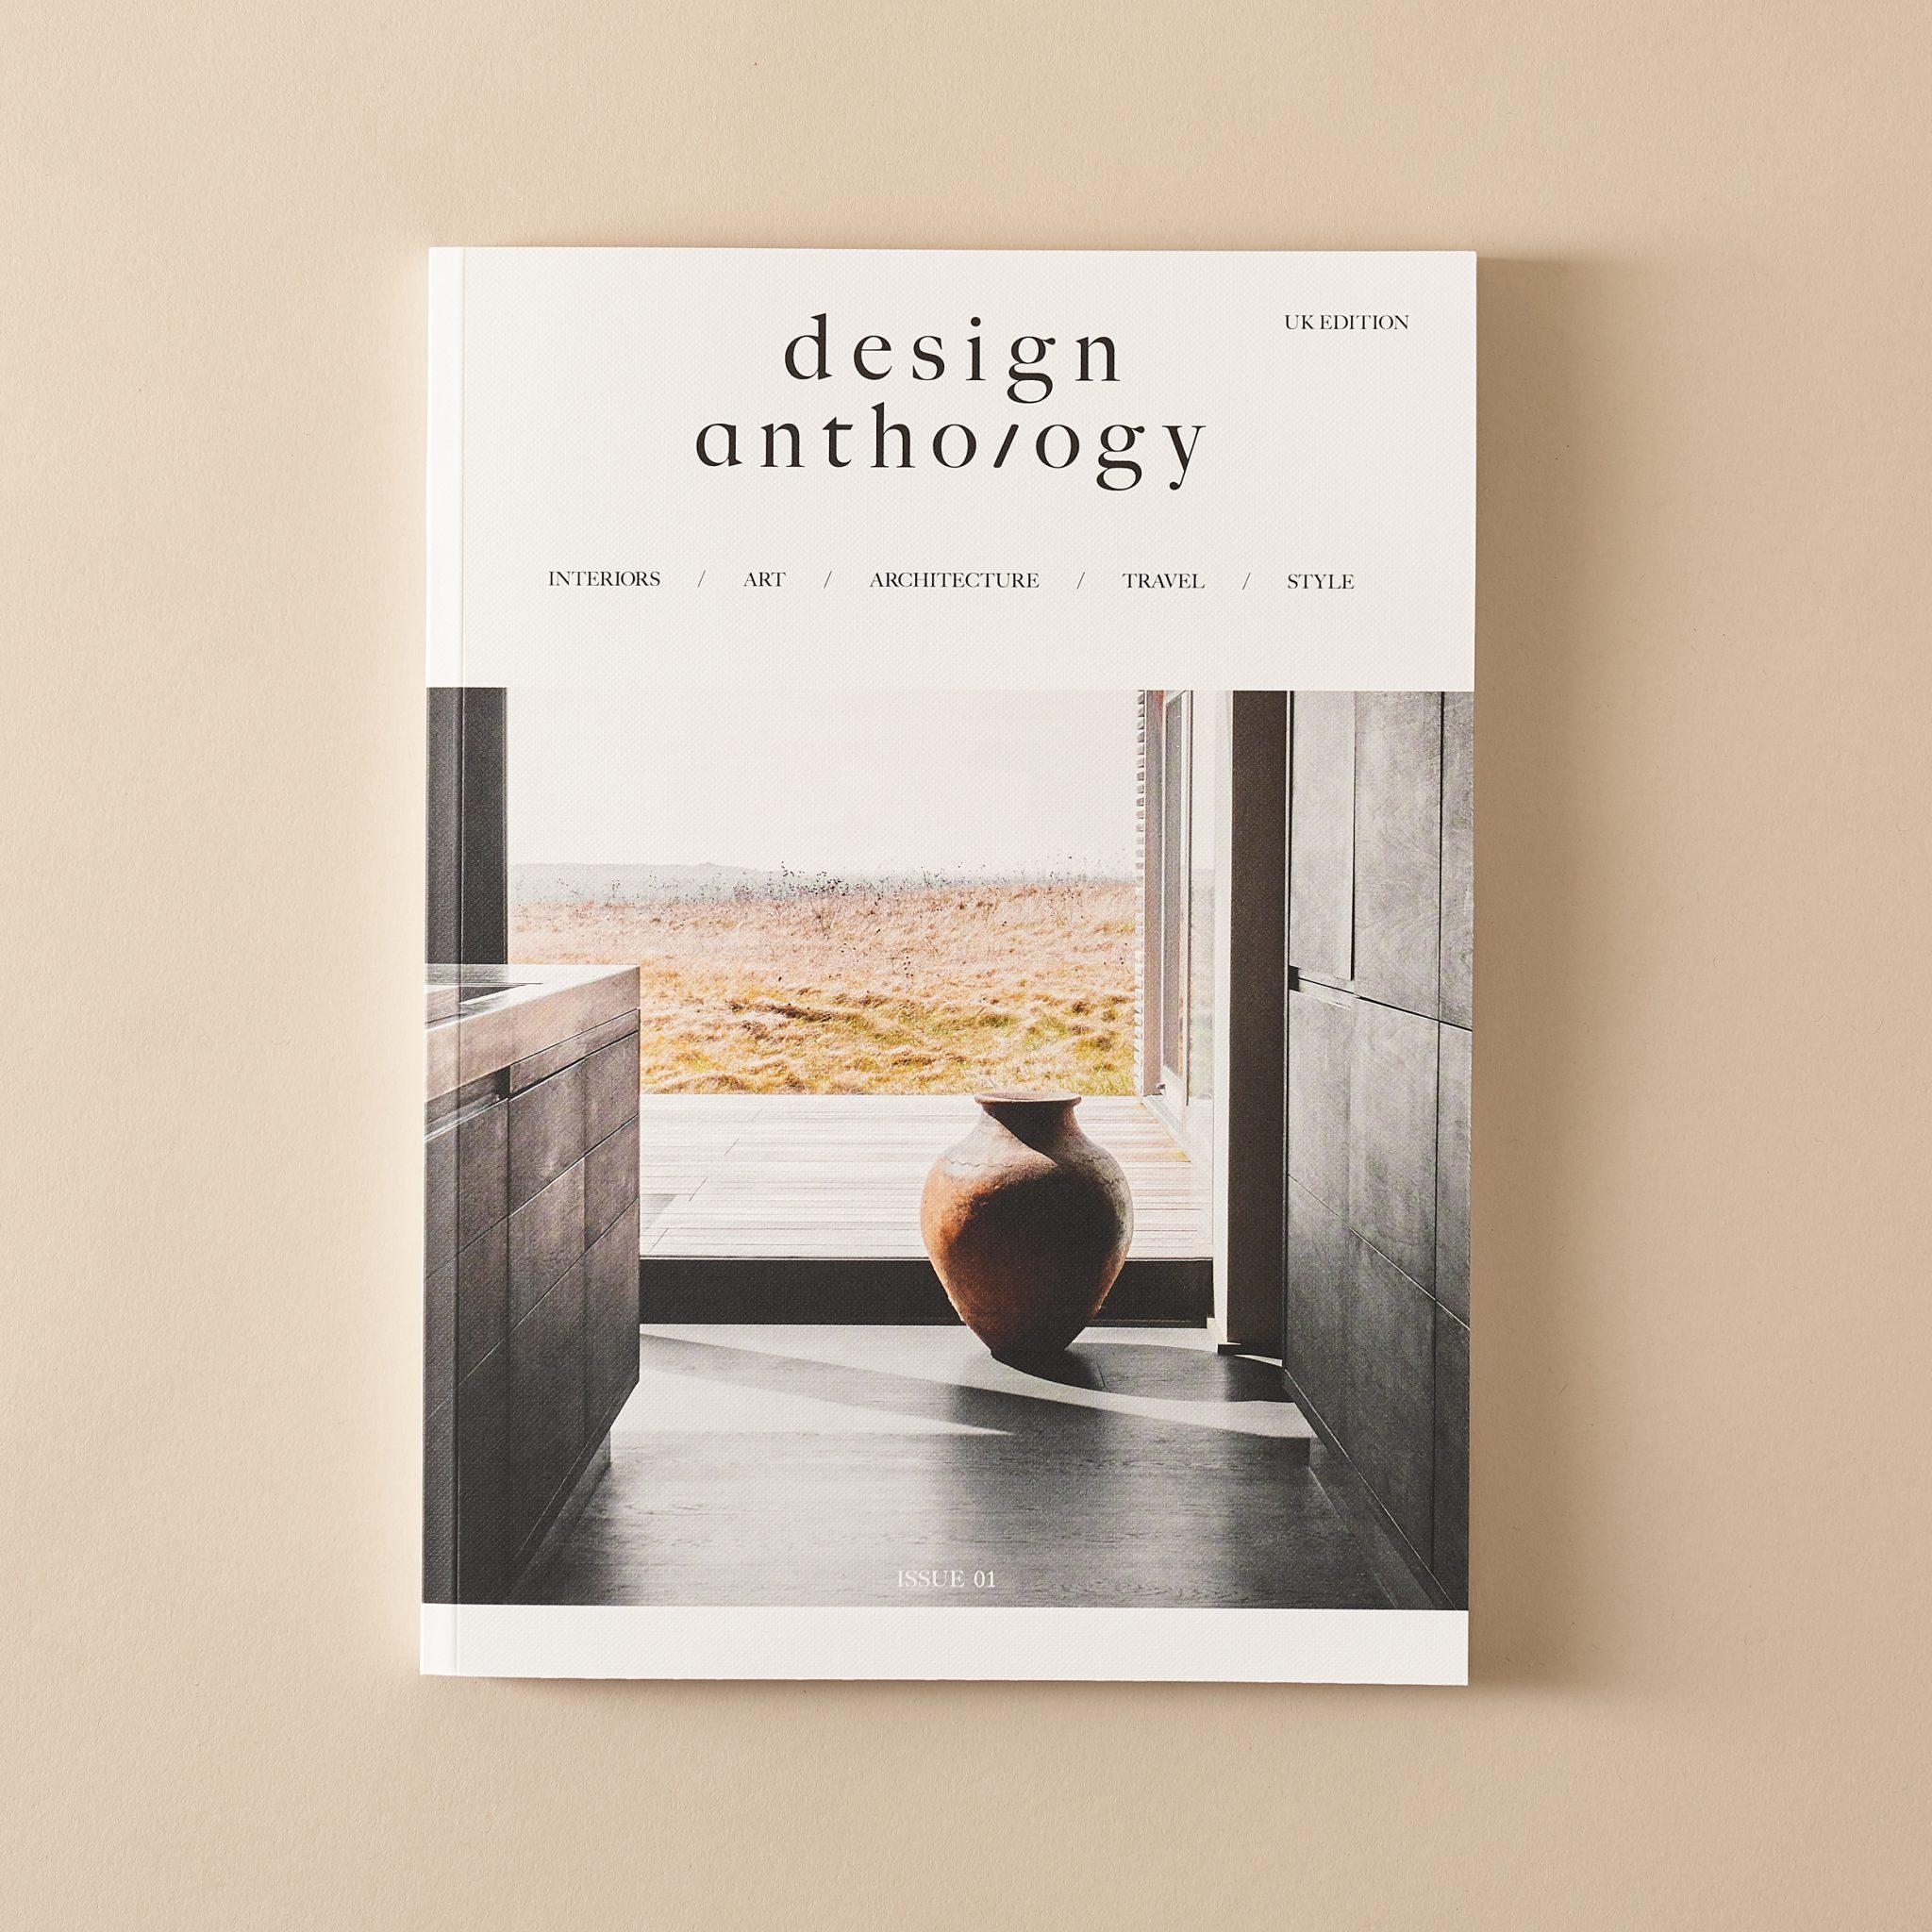 Design-Anthology-12.11.185244-1.jpg